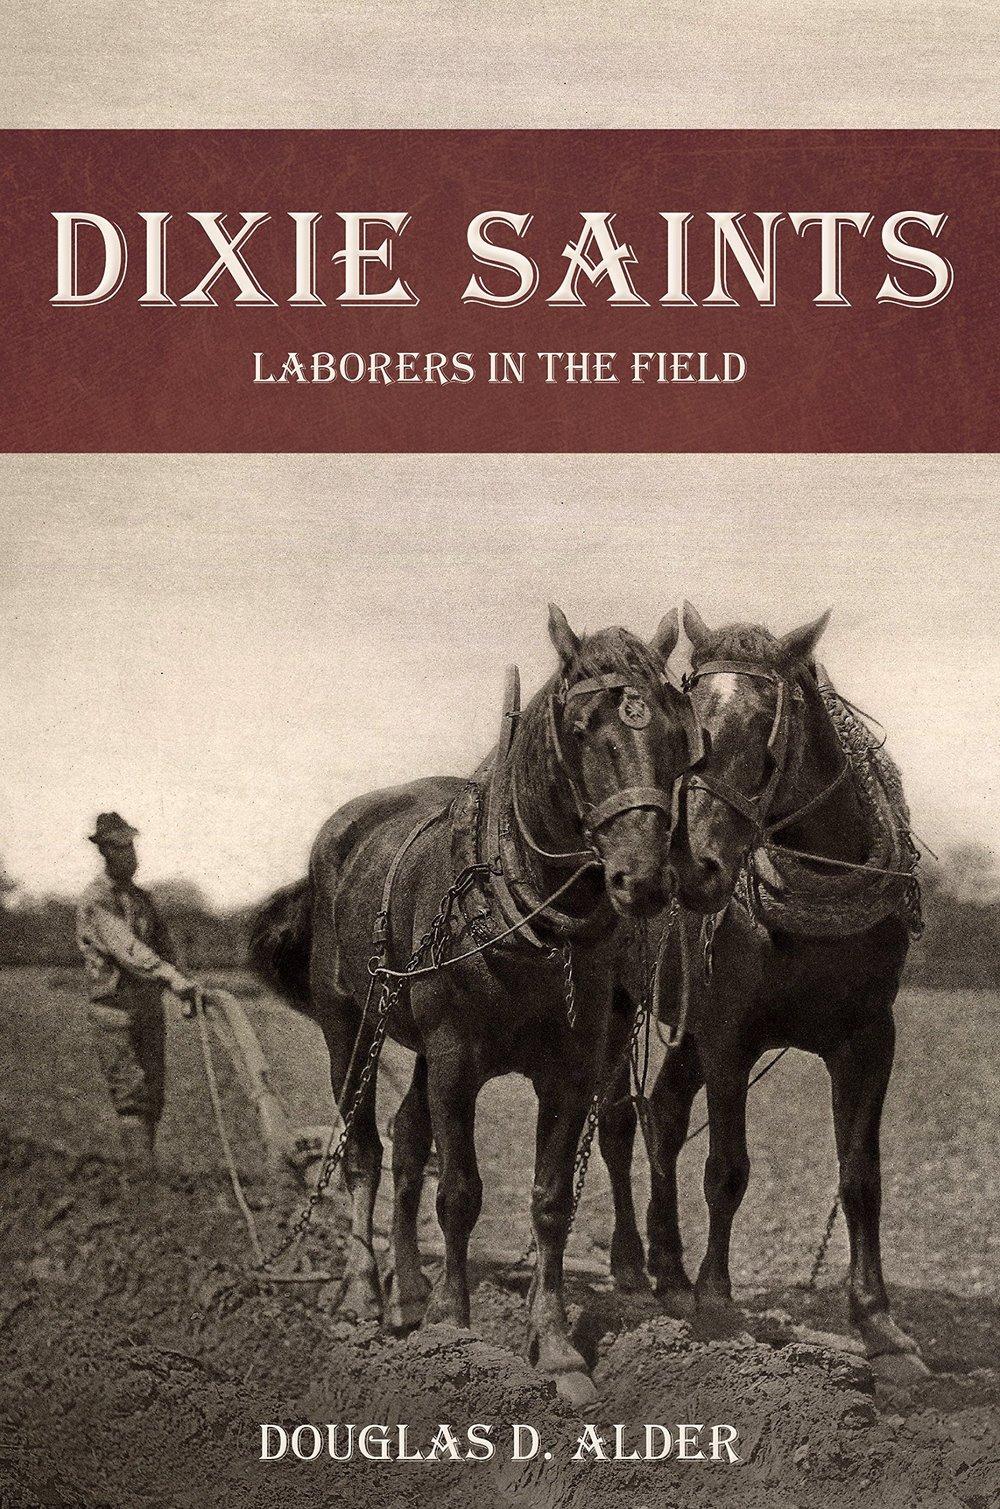 DixieSaints.jpg